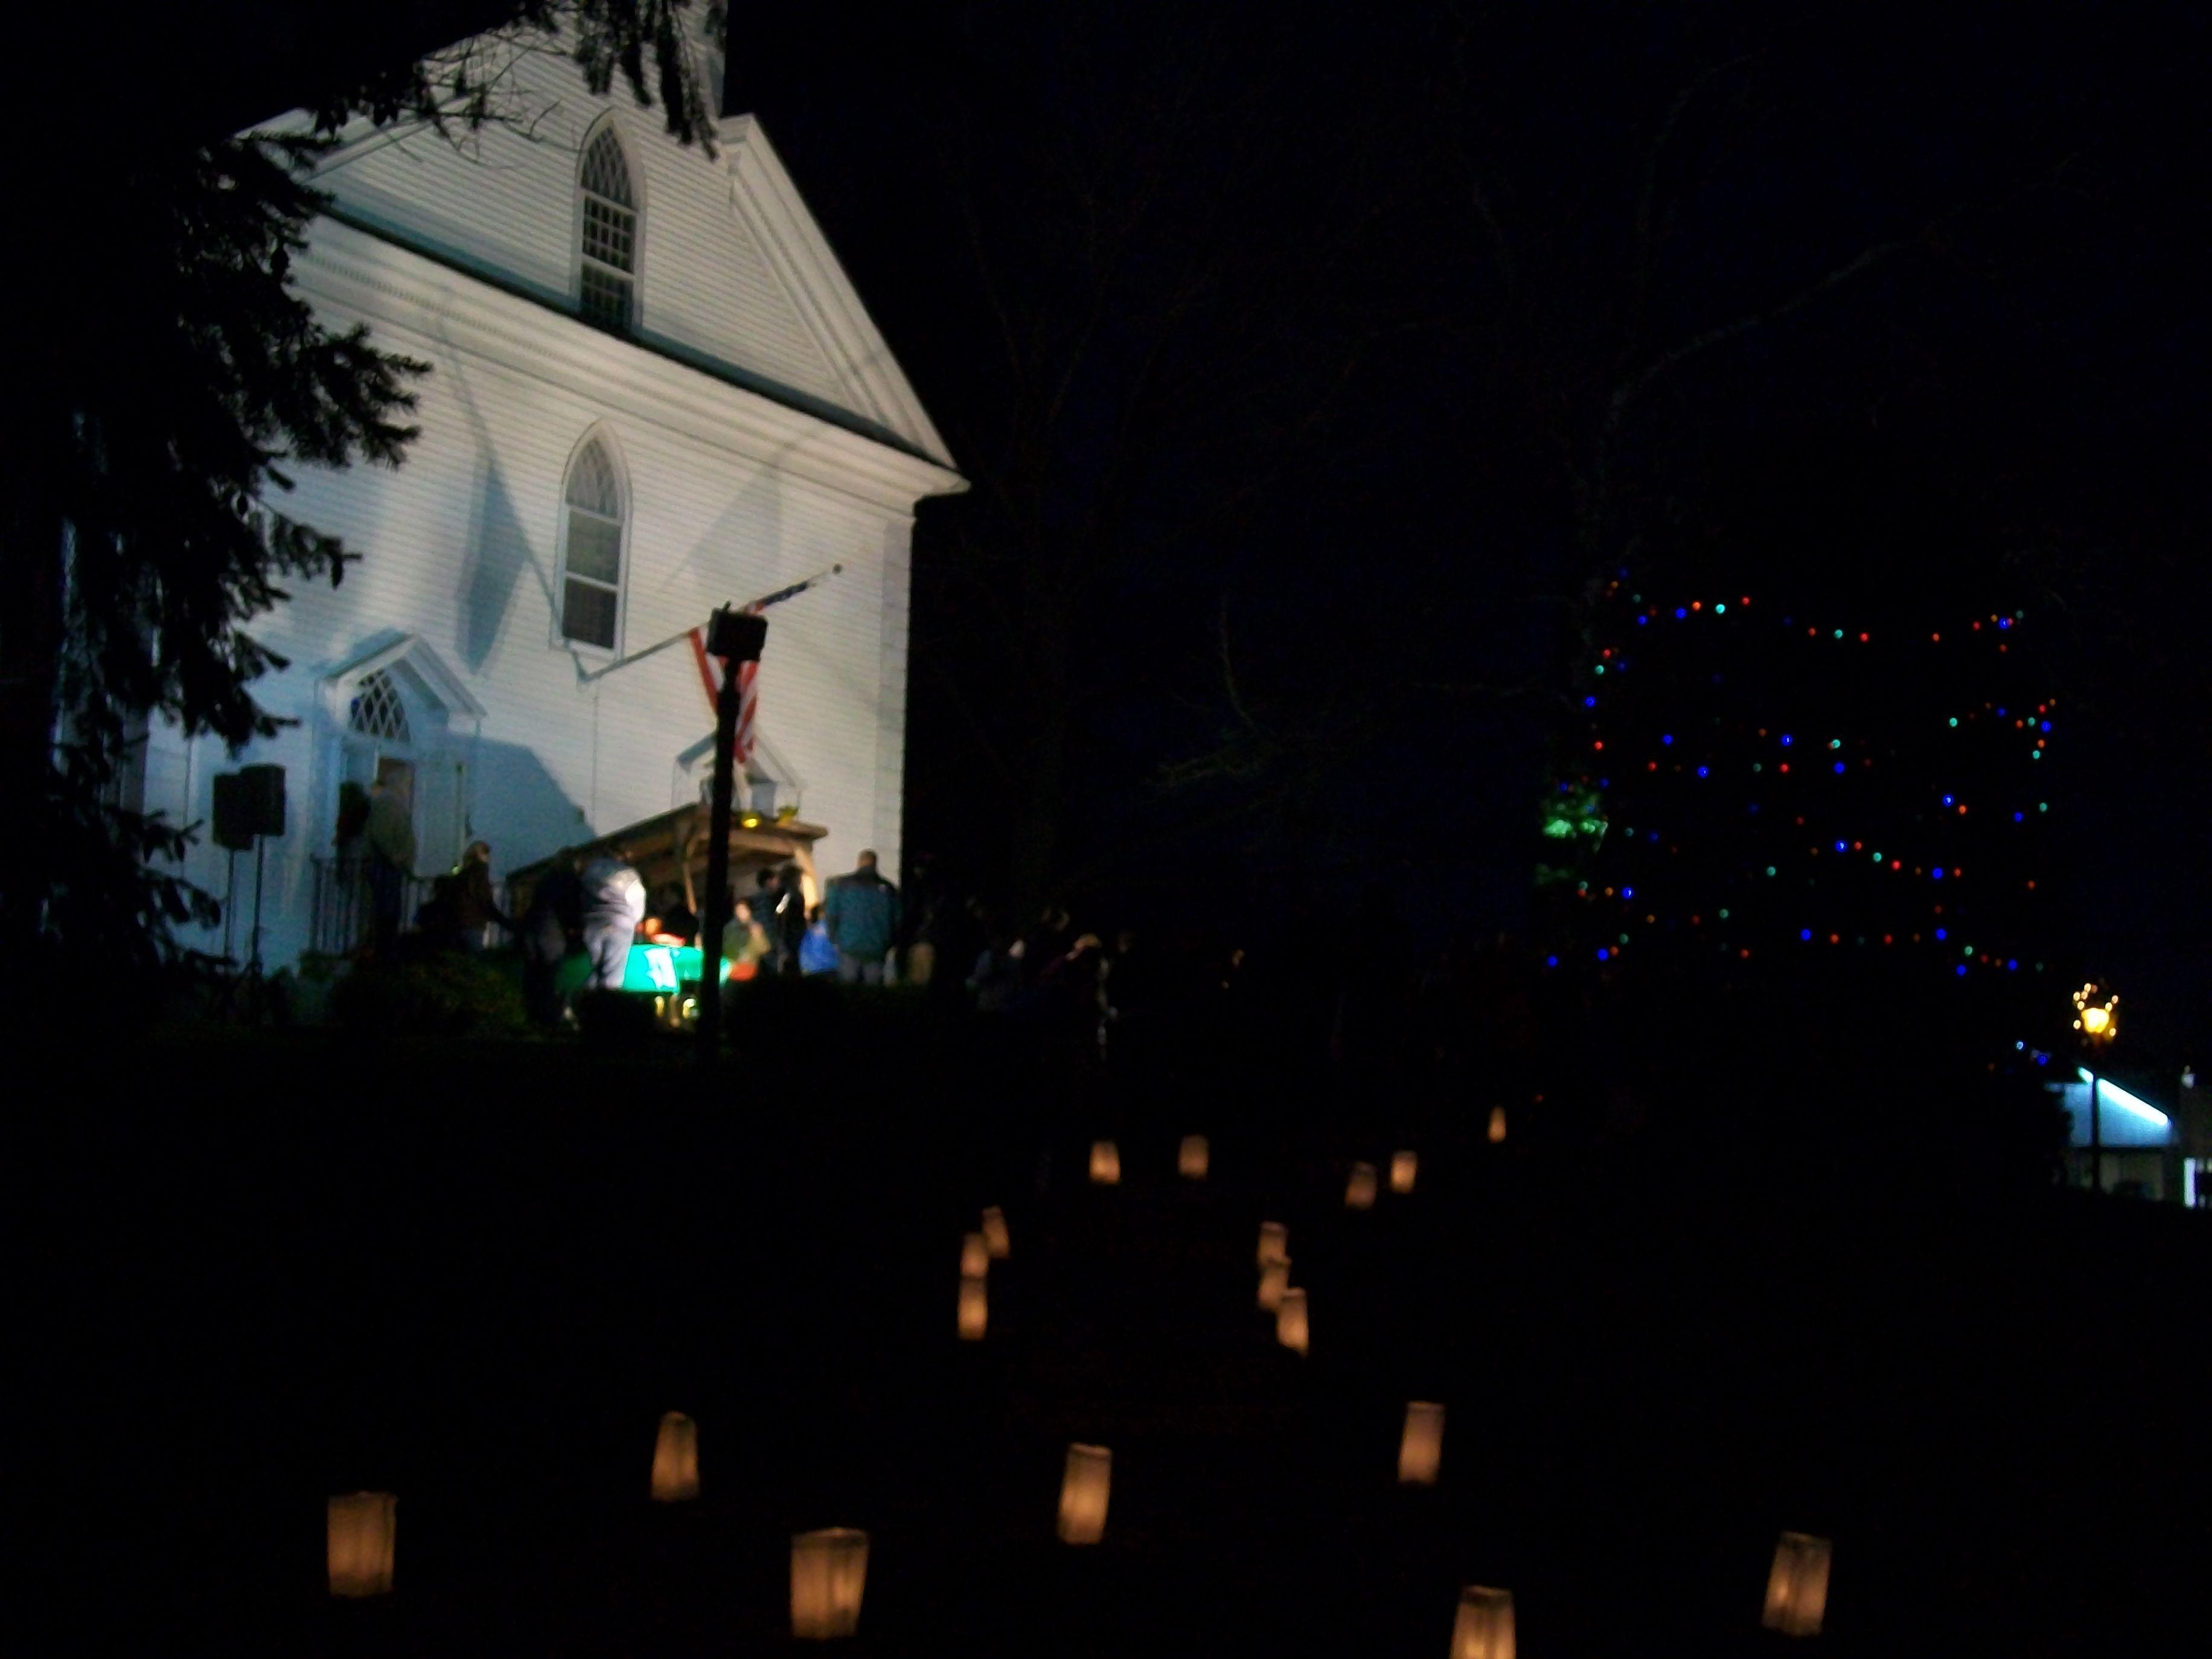 28d5c1fee414e09eed3a_candles_light_the_path_at_the_new_providence_presbyterian_church.jpg